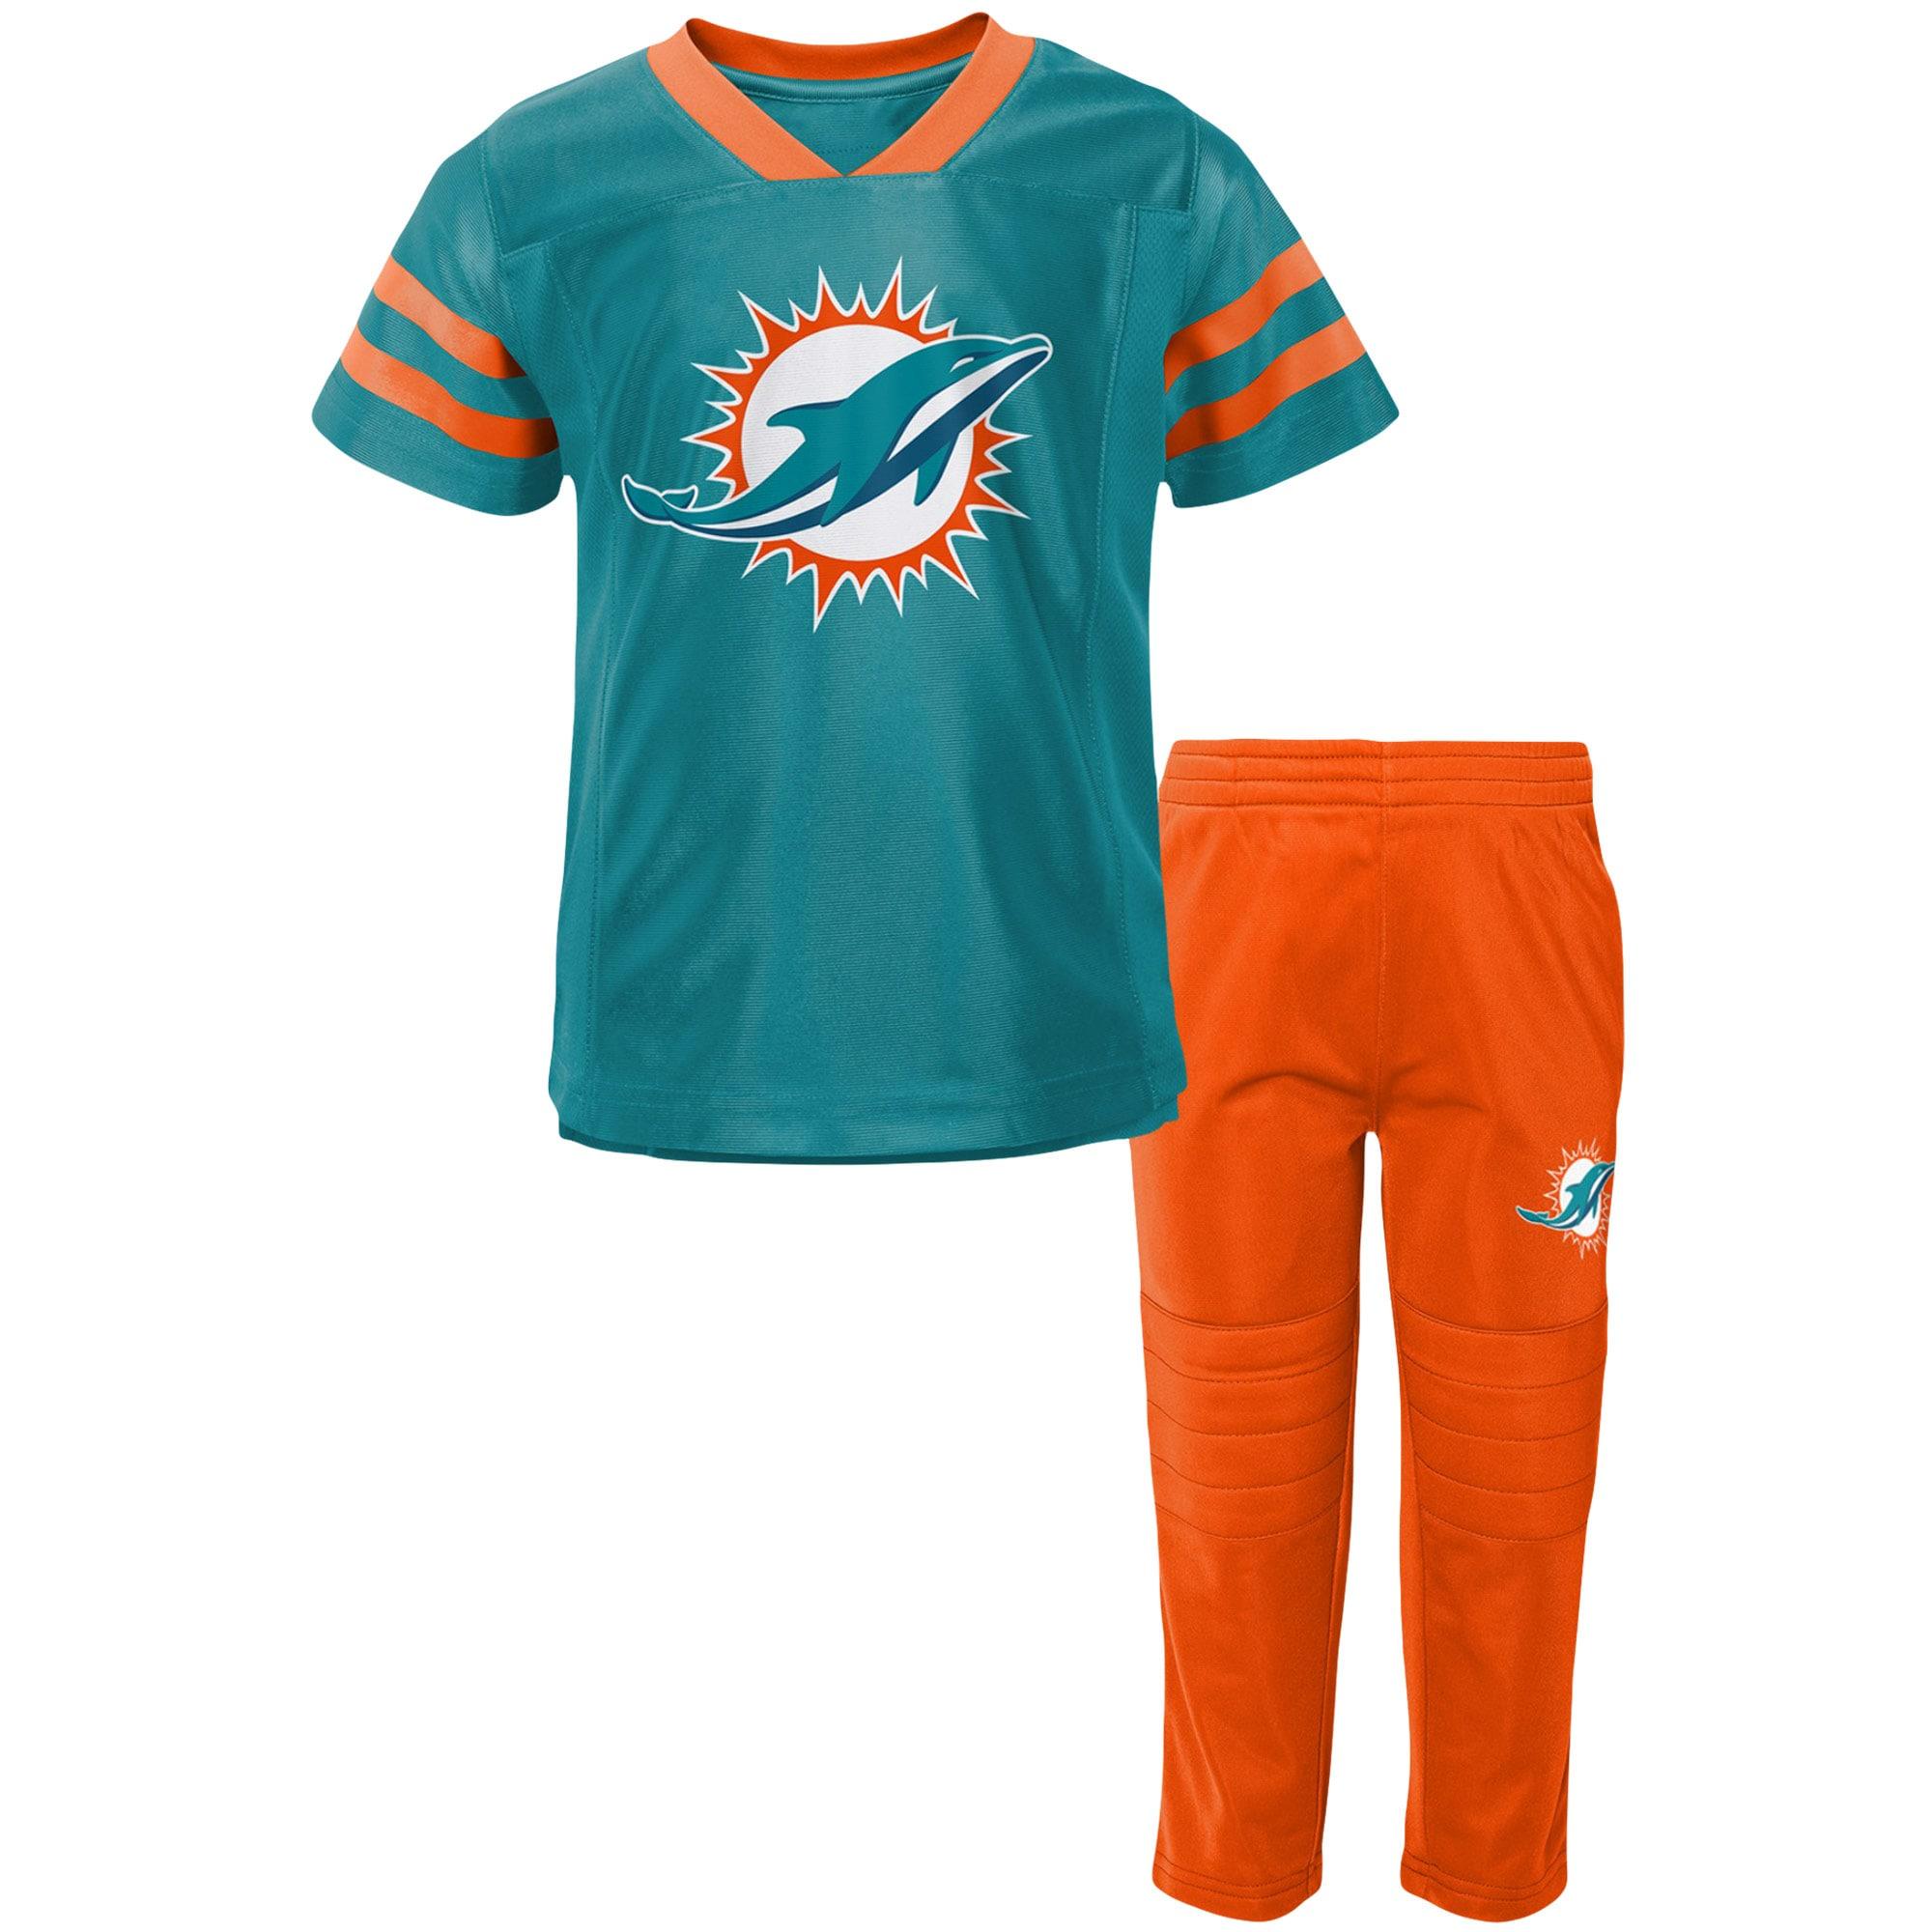 Miami Dolphins Toddler Training Camp V-Neck T-Shirt & Pants Set - Aqua/Orange